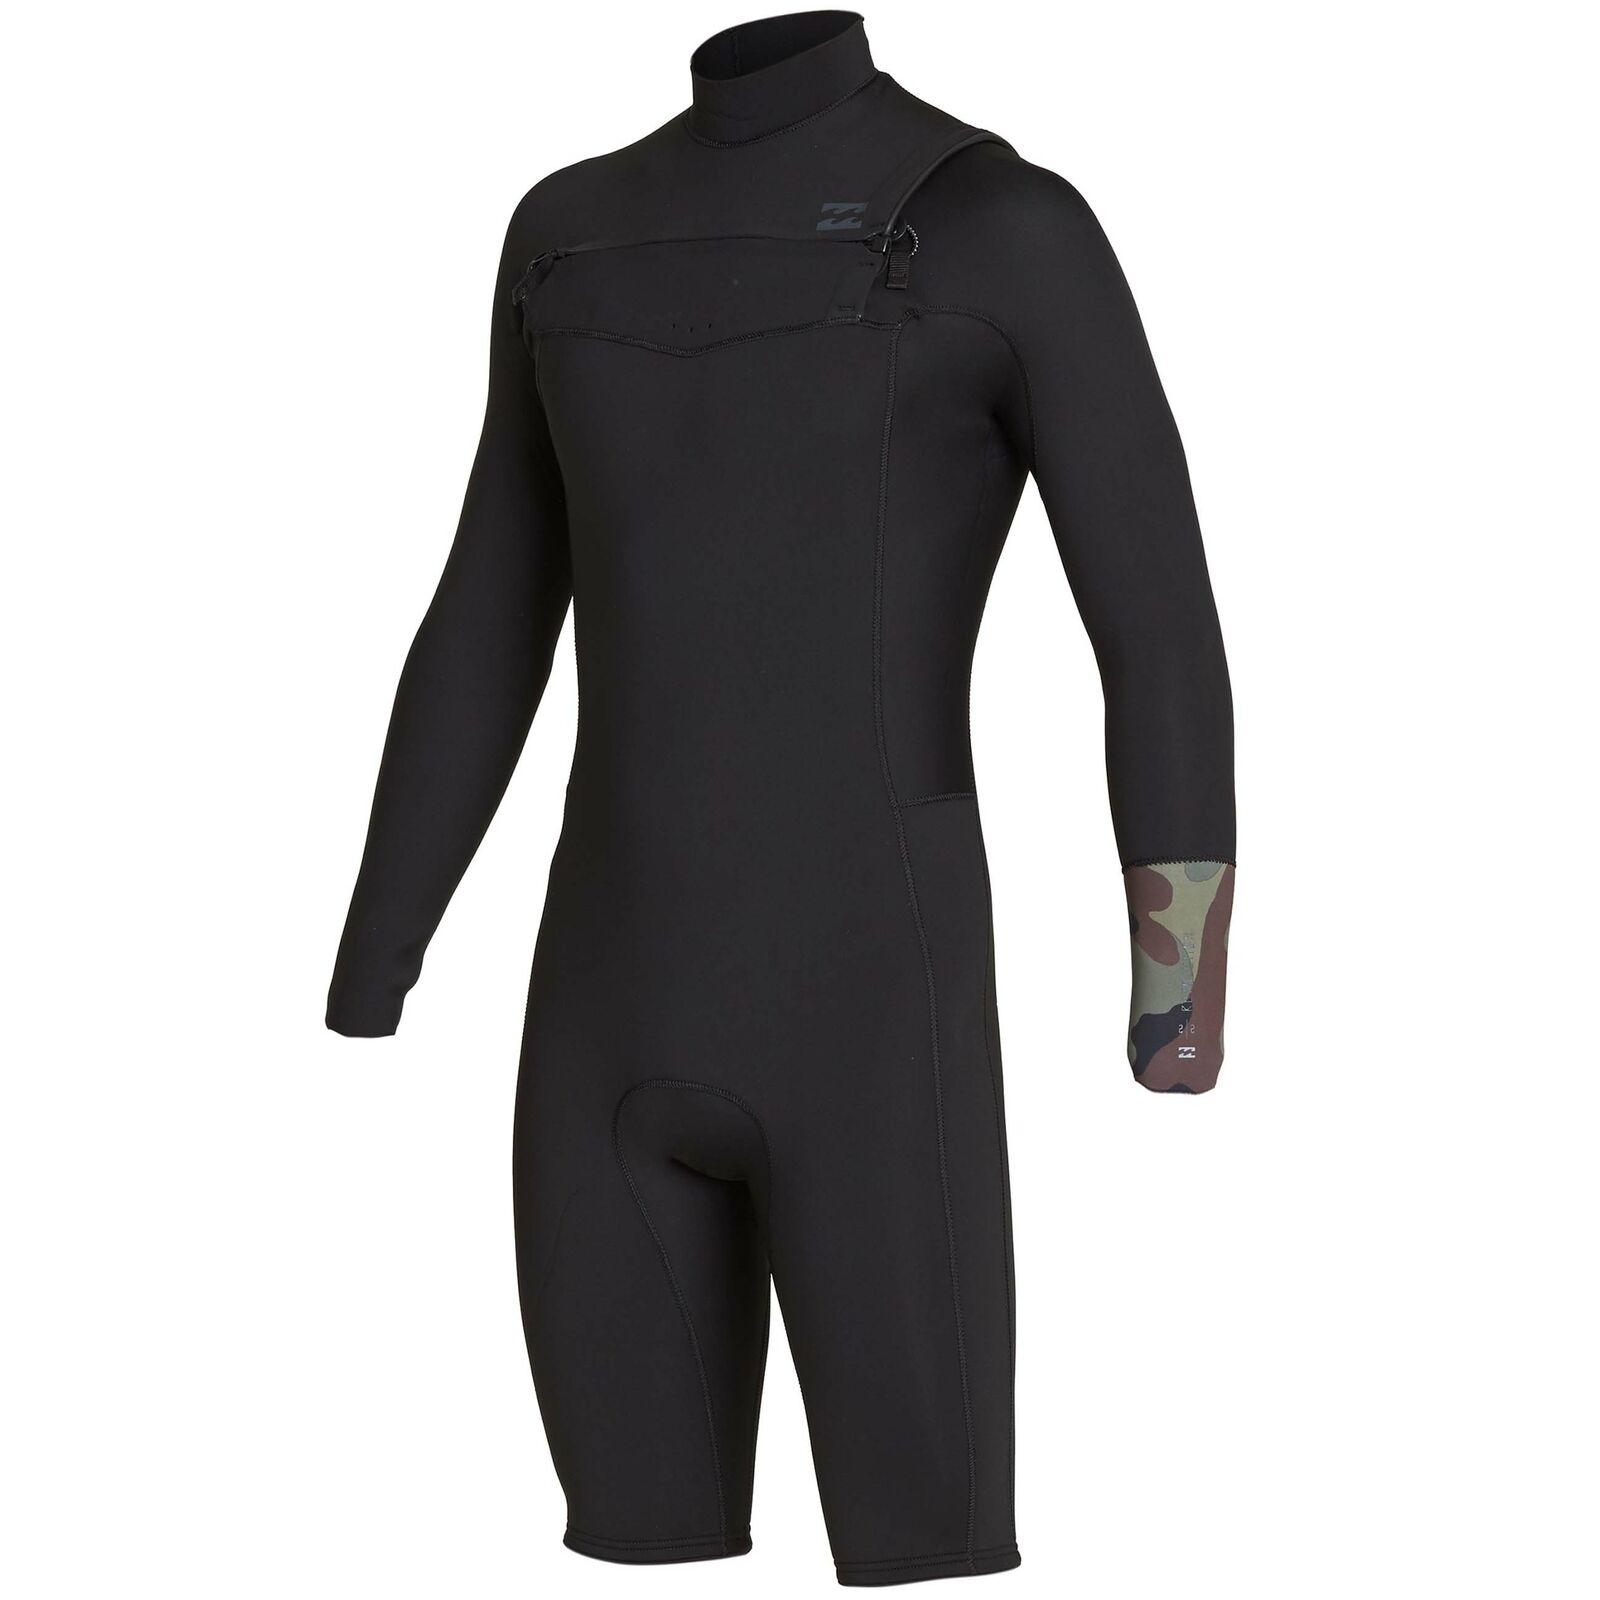 Billabong Mens Furnace Revolution 2 2mm Chest Zip Spring Wetsuit Camo